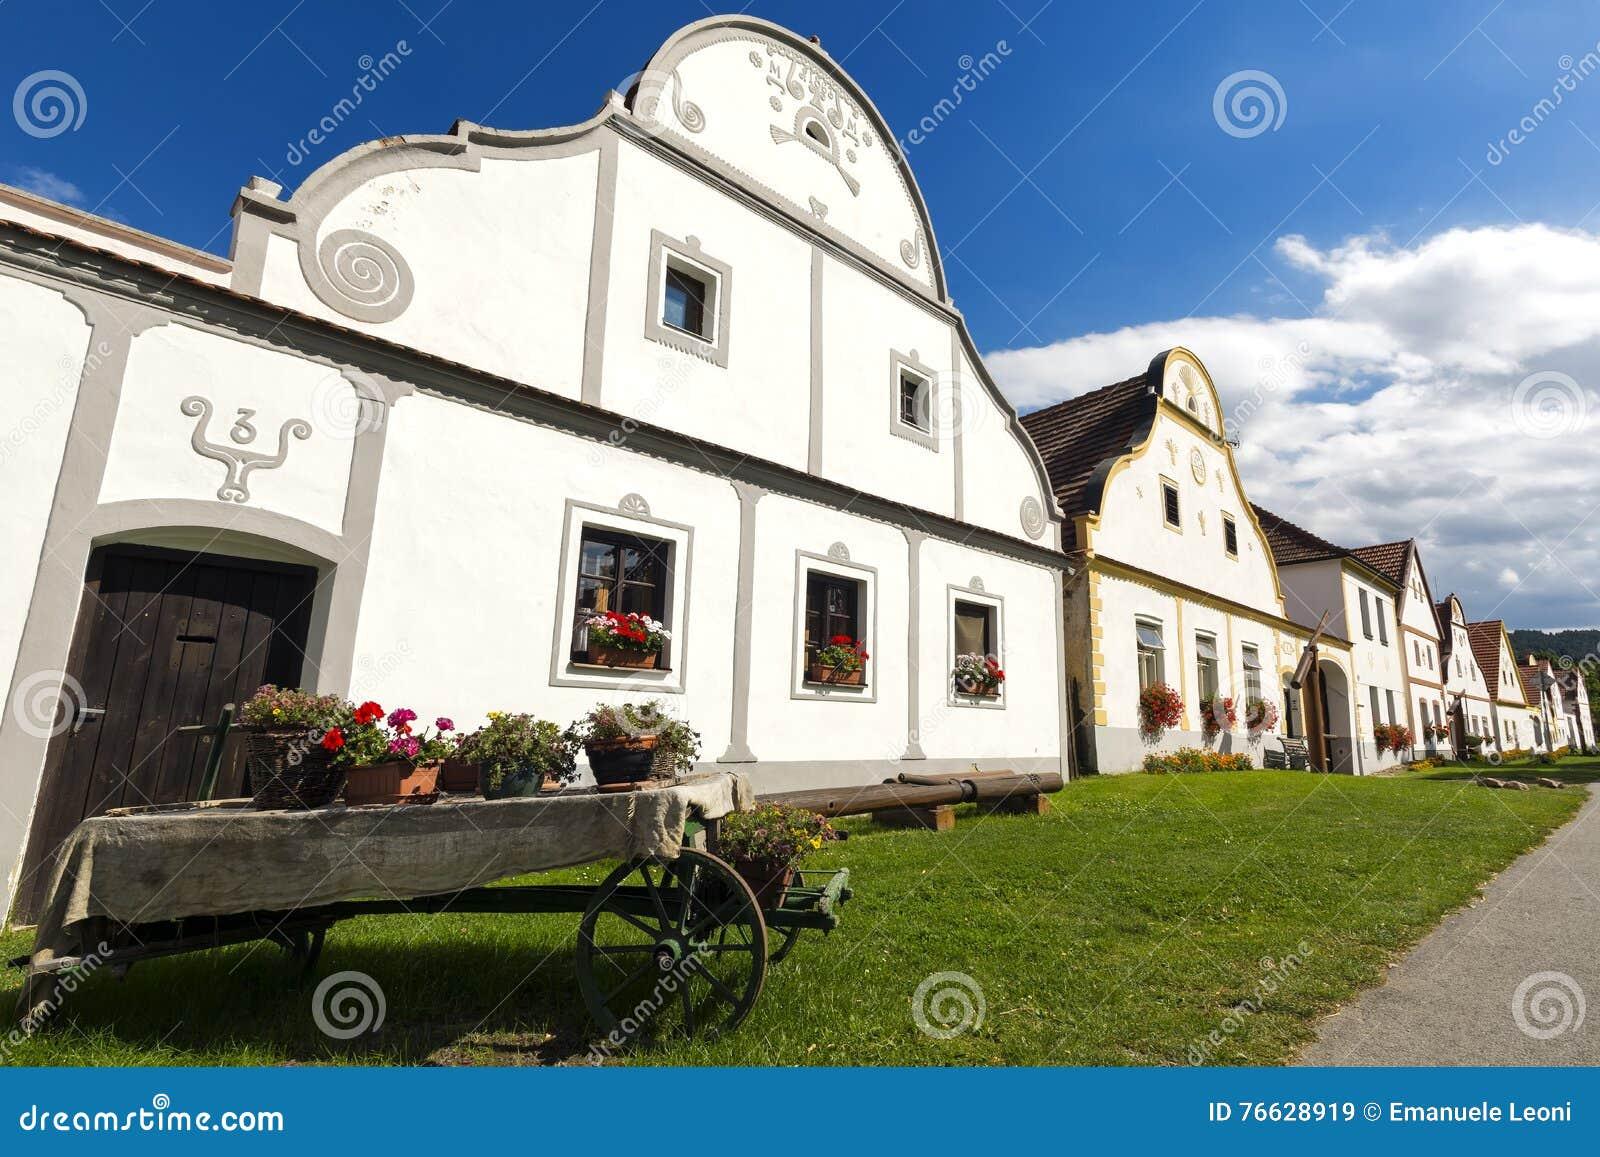 Village Holasovice, UNESCO world heritage, Czech republic, Europe.